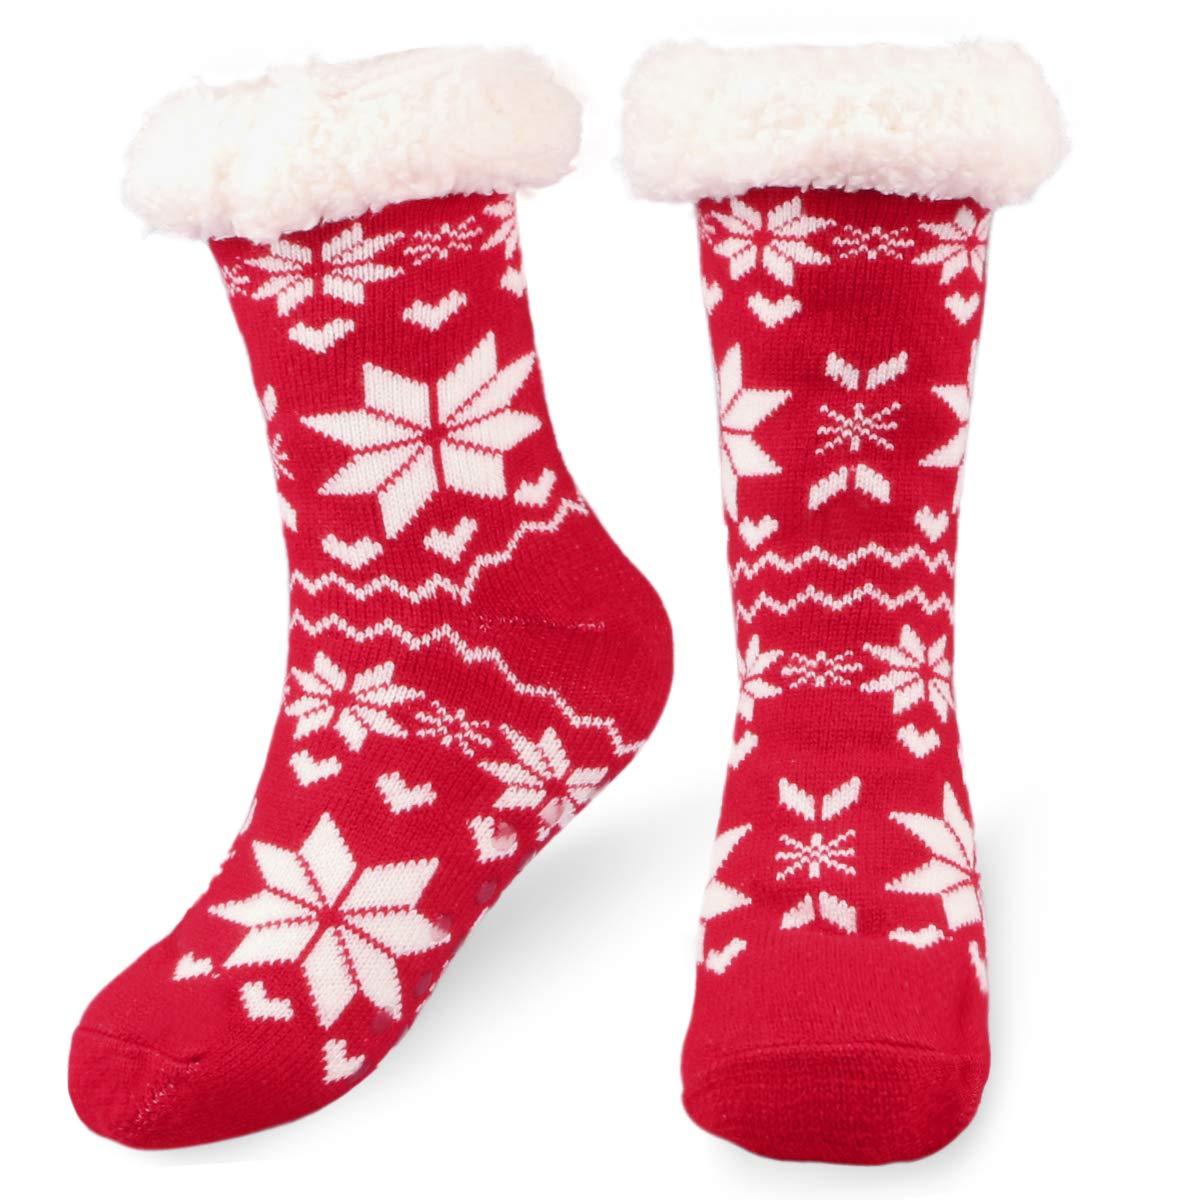 Fixget Calzini pantofola, donne Premium Soft inverno maglia pile, calze antiscivolo caldo fuzzy calzini accoglienti pantofola, gambaletti calze pantofola calze